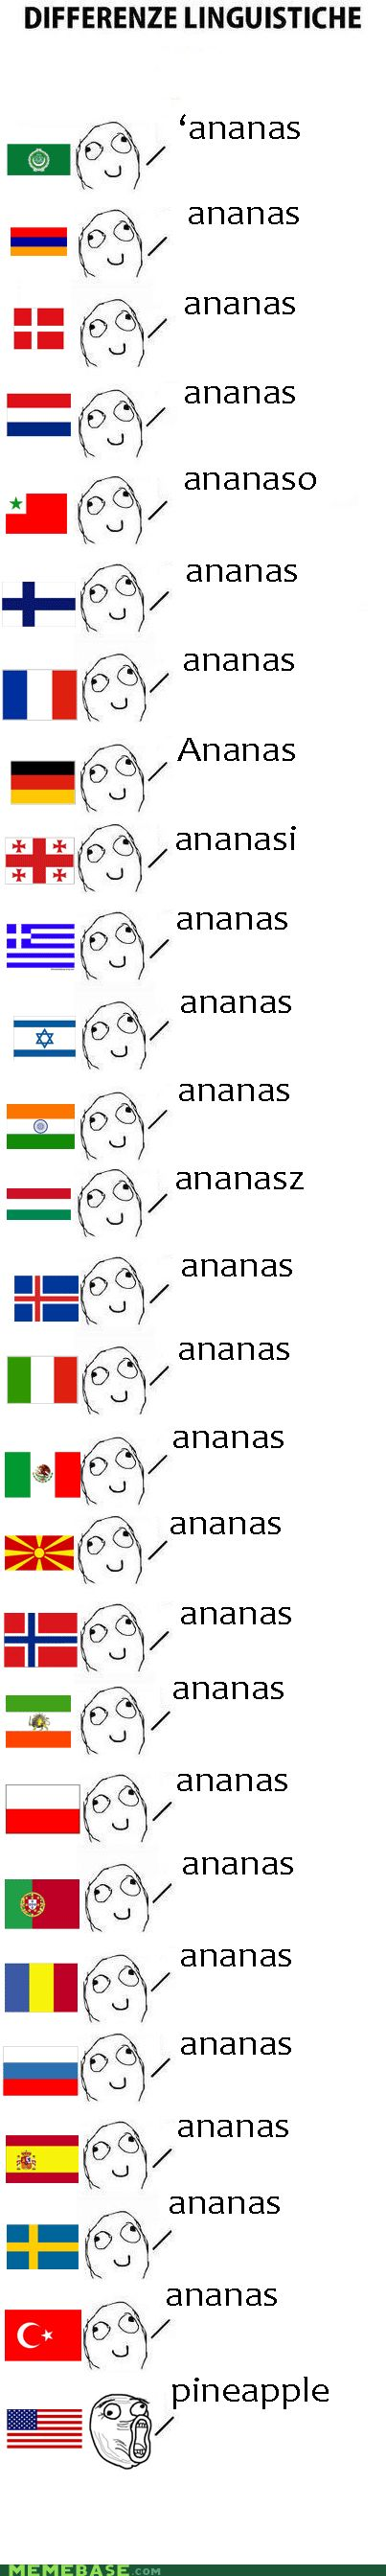 English: Language of LOLs